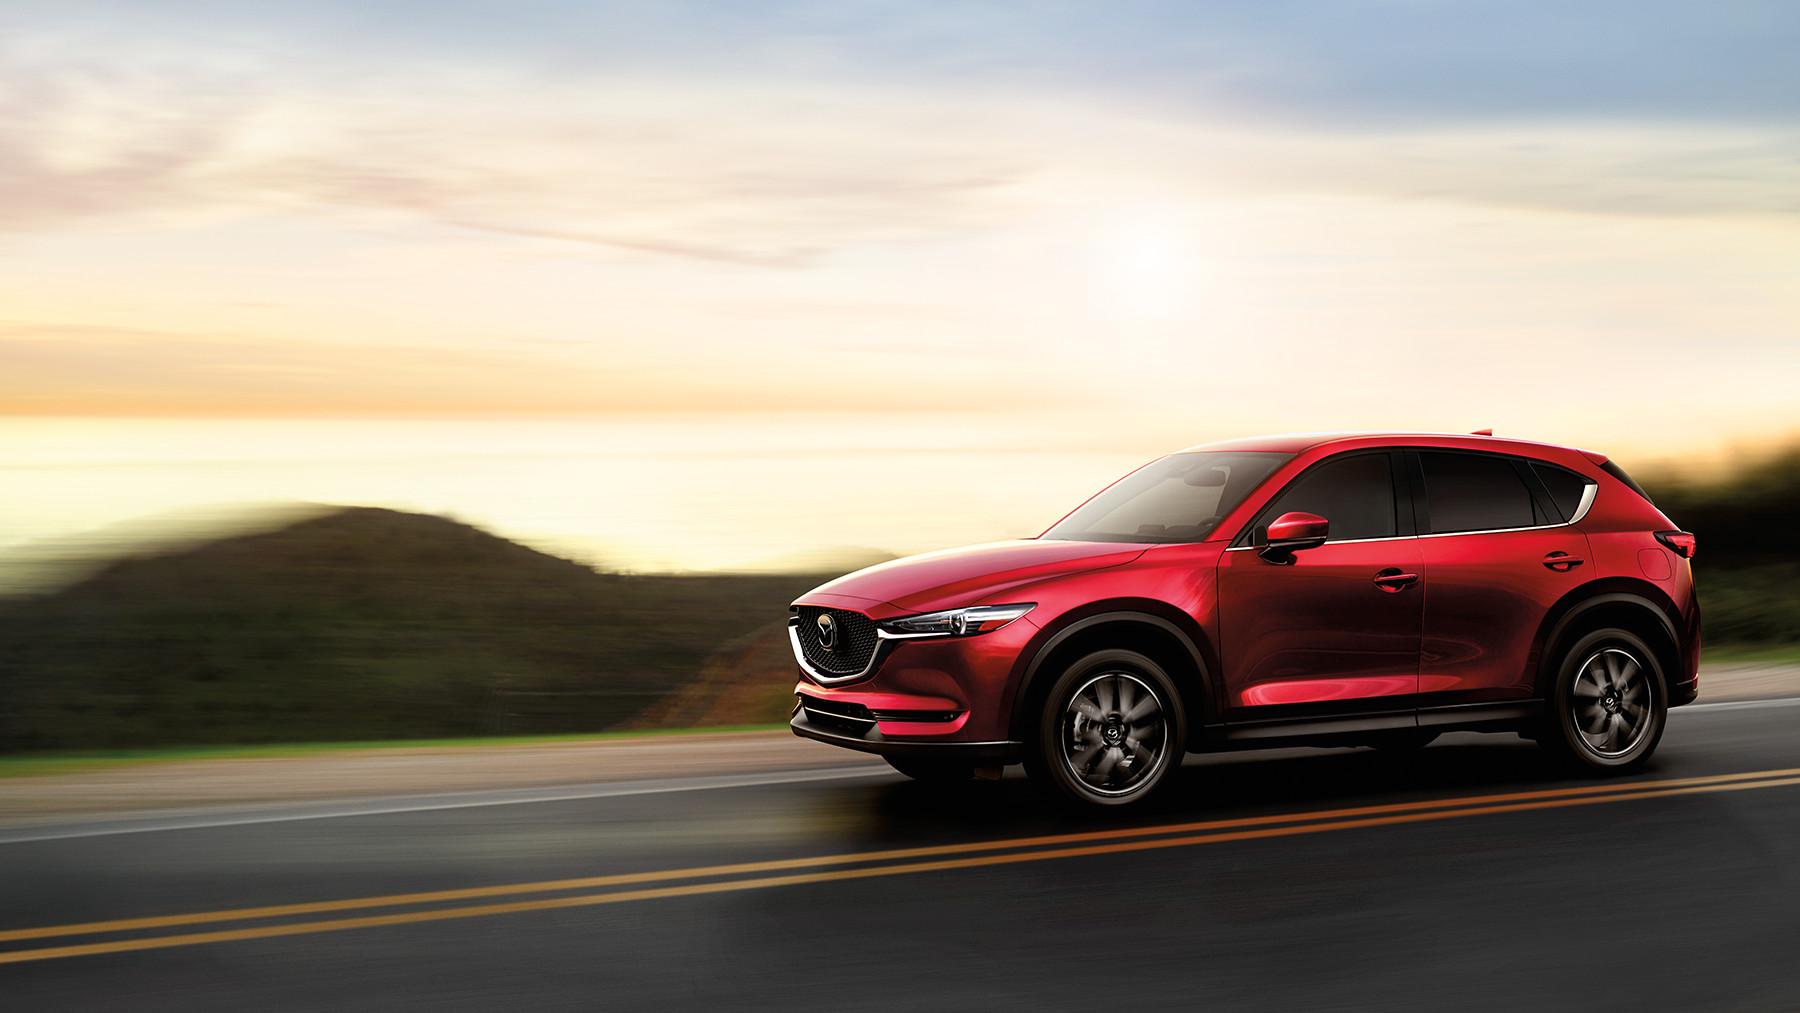 2017 Mazda Cx 5 Vs 2017 Nissan Rogue Near Baytown Tx Mazda Of